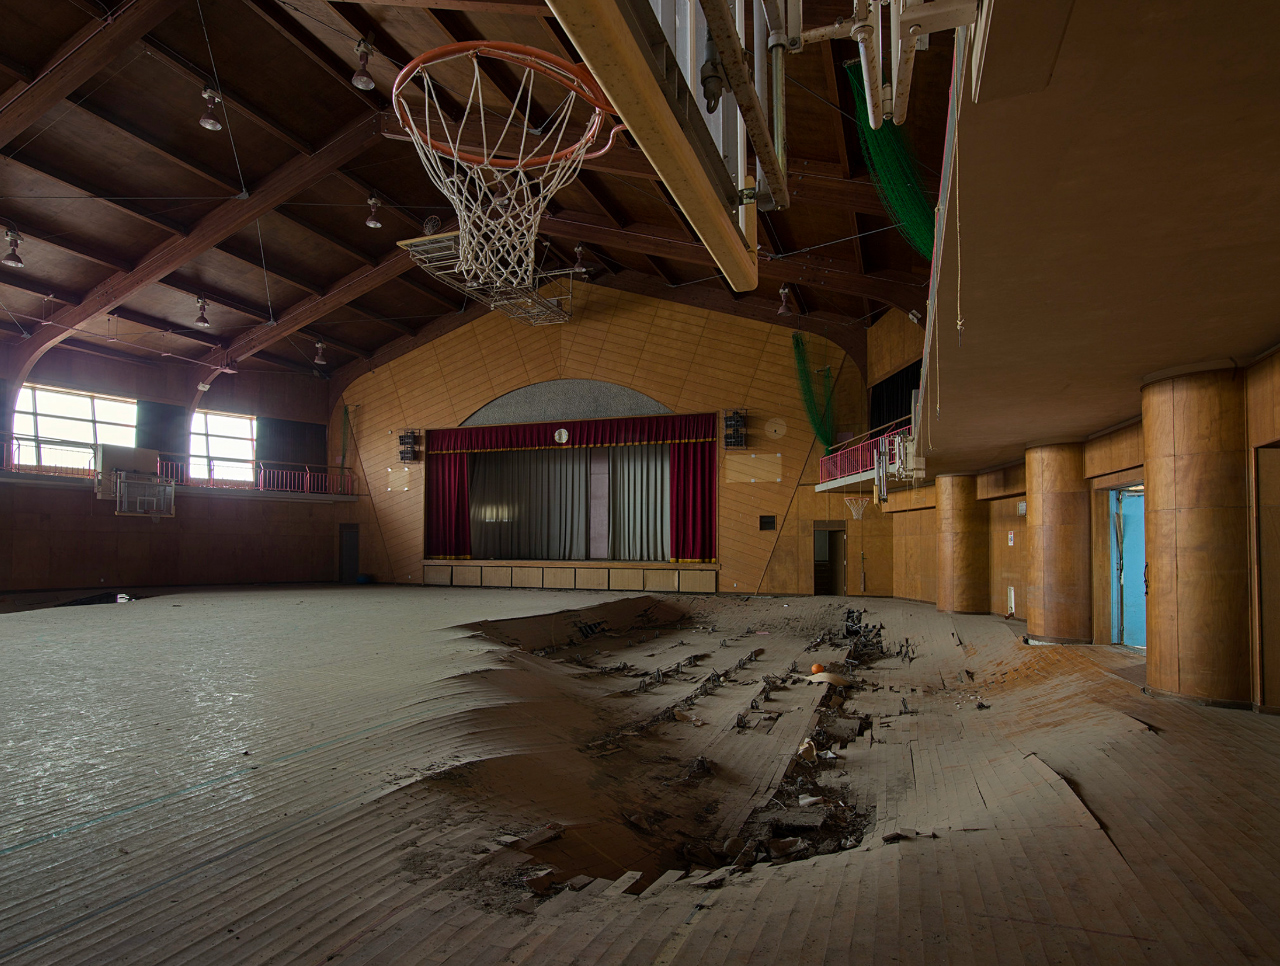 Fukushima Exclusion Zone sporthal